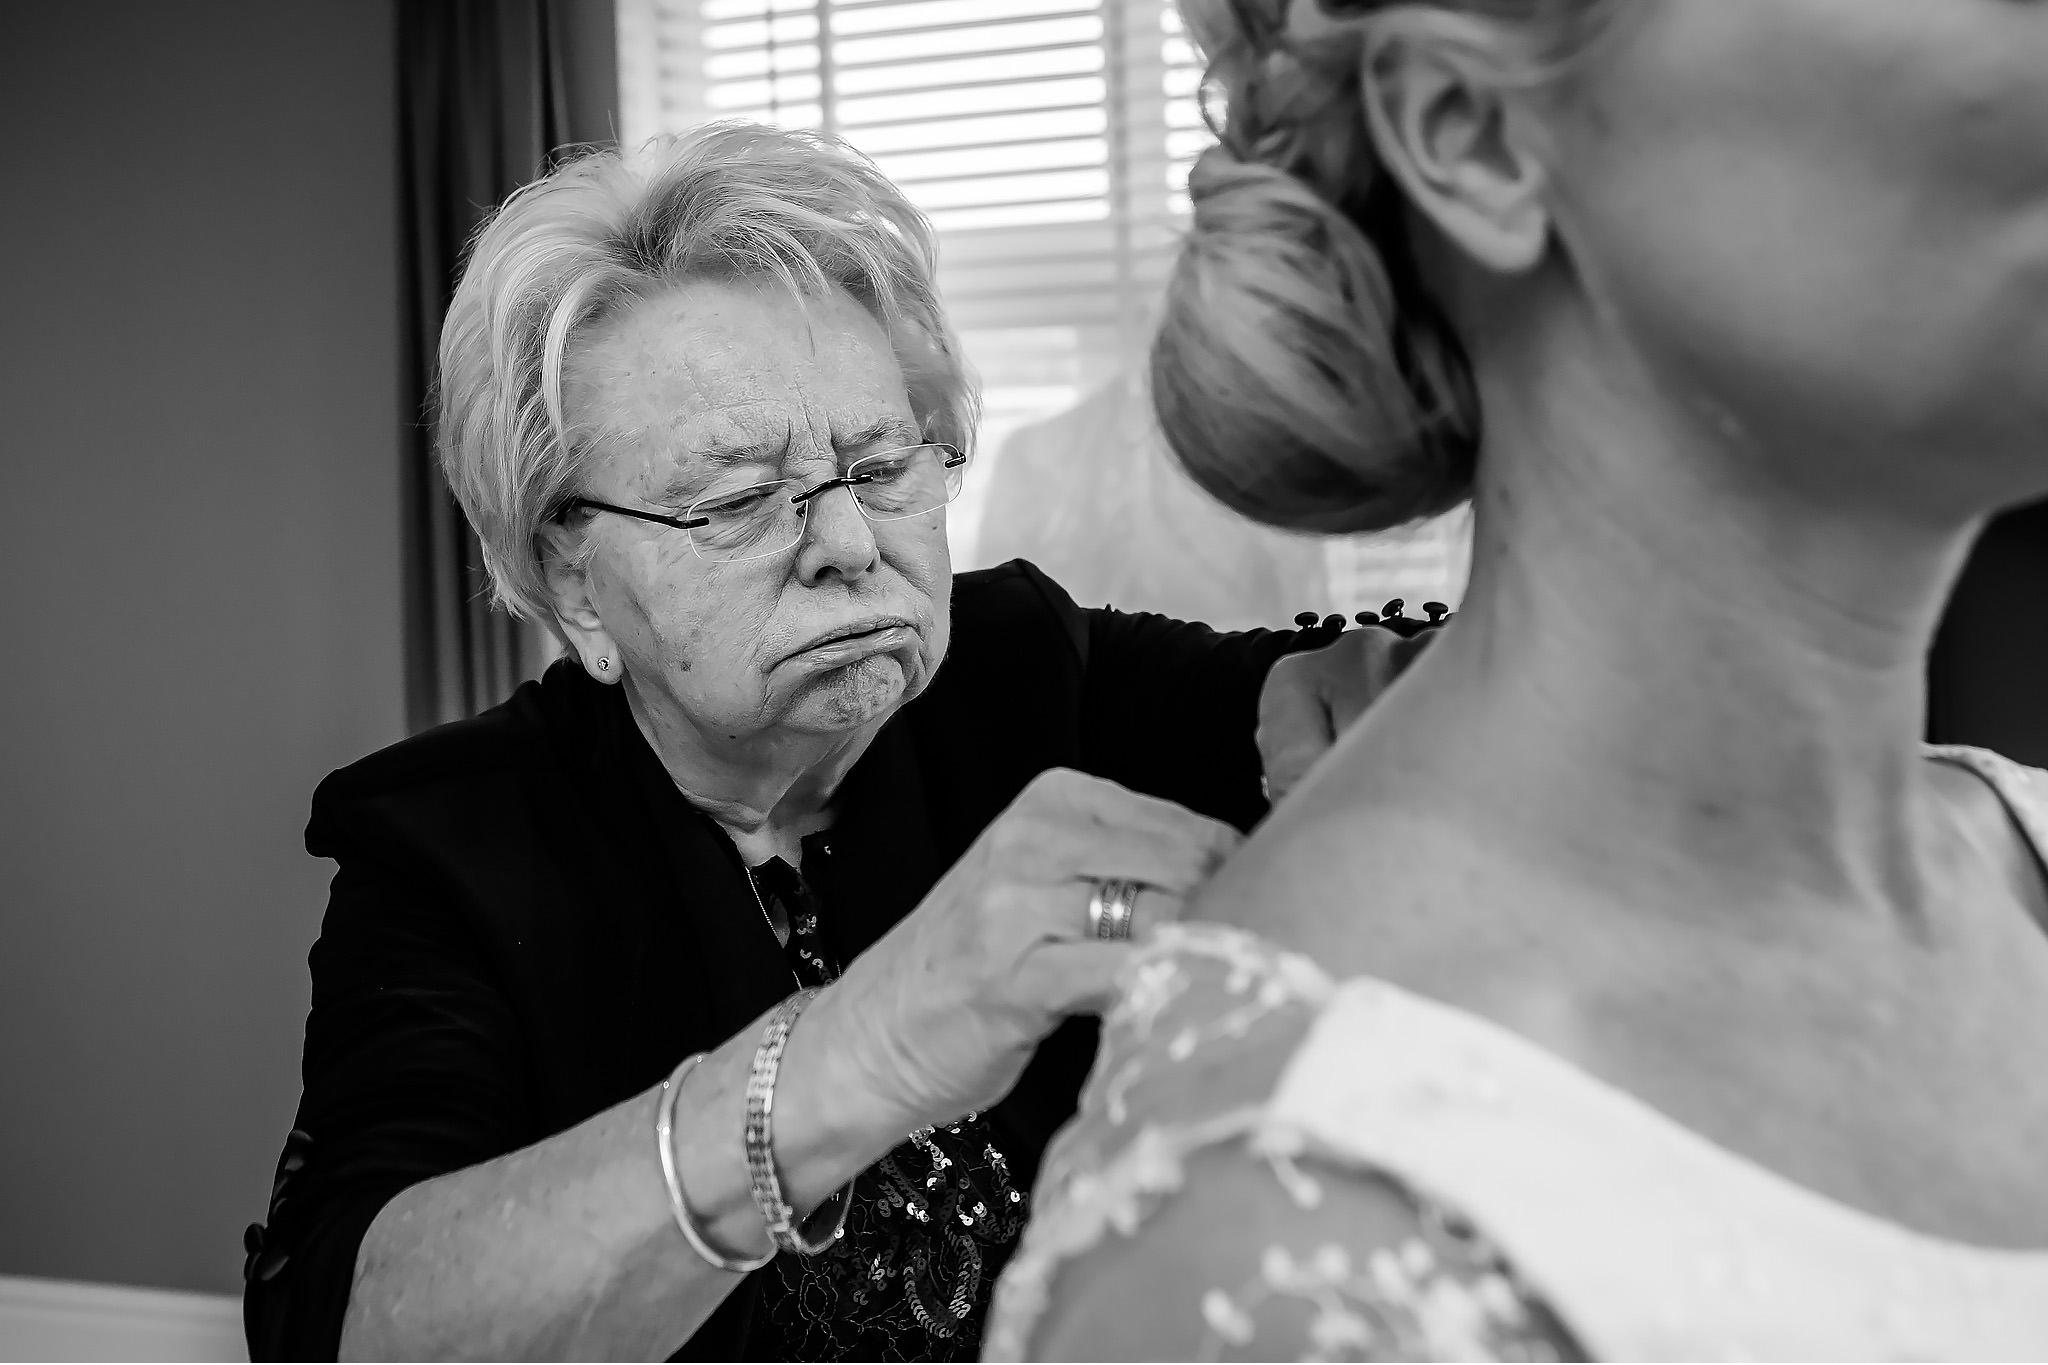 Bruidsreportage Bruidsfotografie Wedding Photographer 079 Bas Driessen Photography